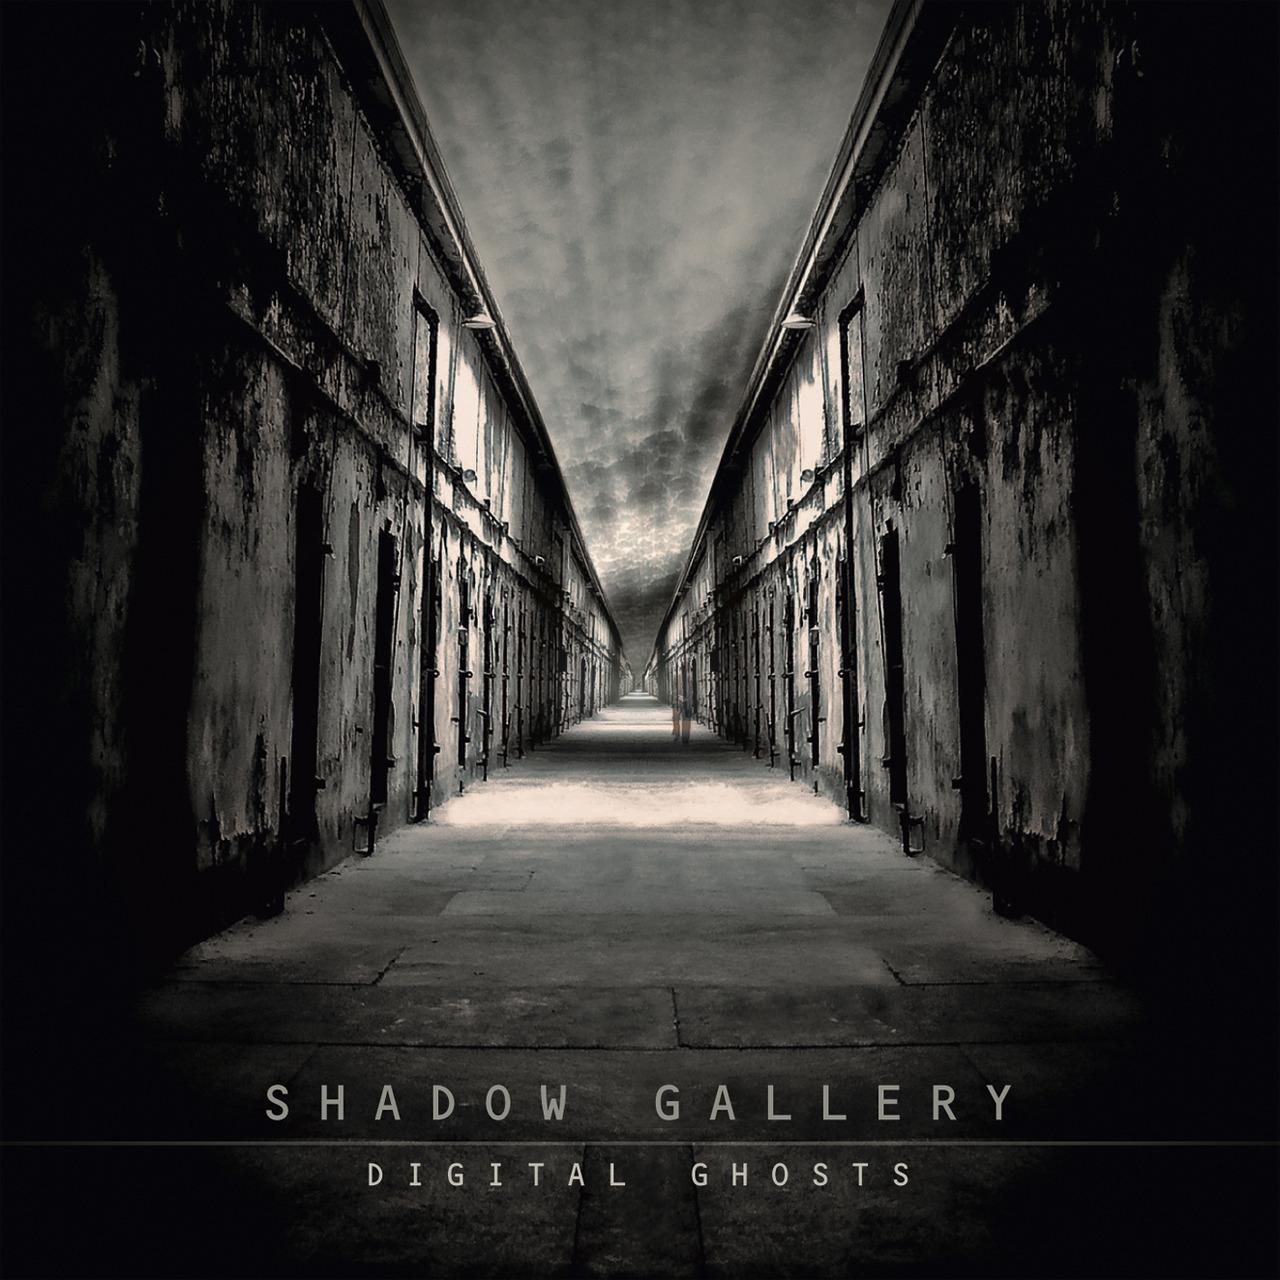 SHADOW GALLERY - Digital Ghosts cover